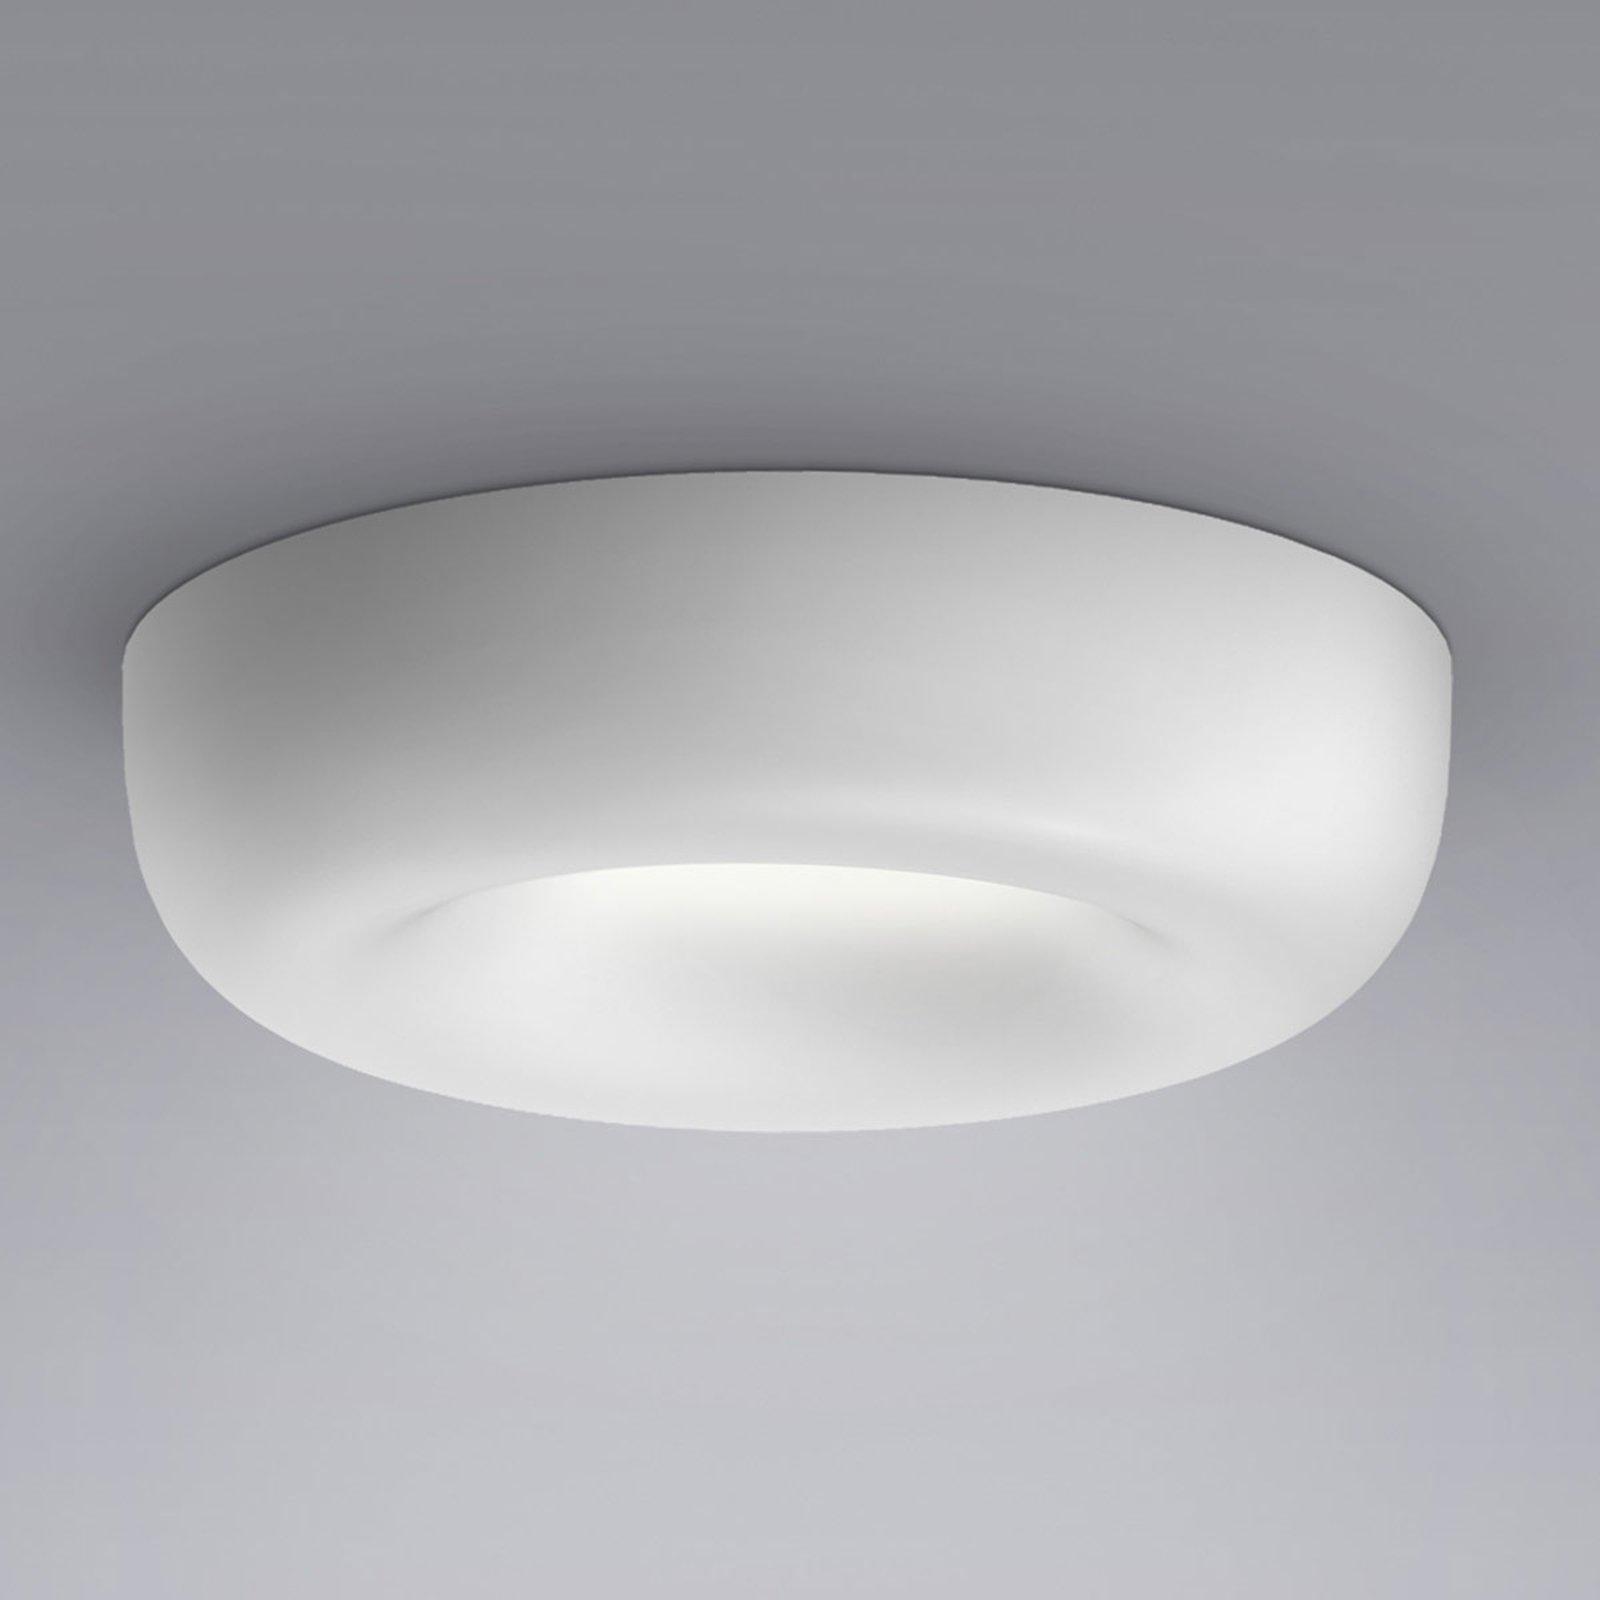 serien.lighting Cavity Recessed L, hvit